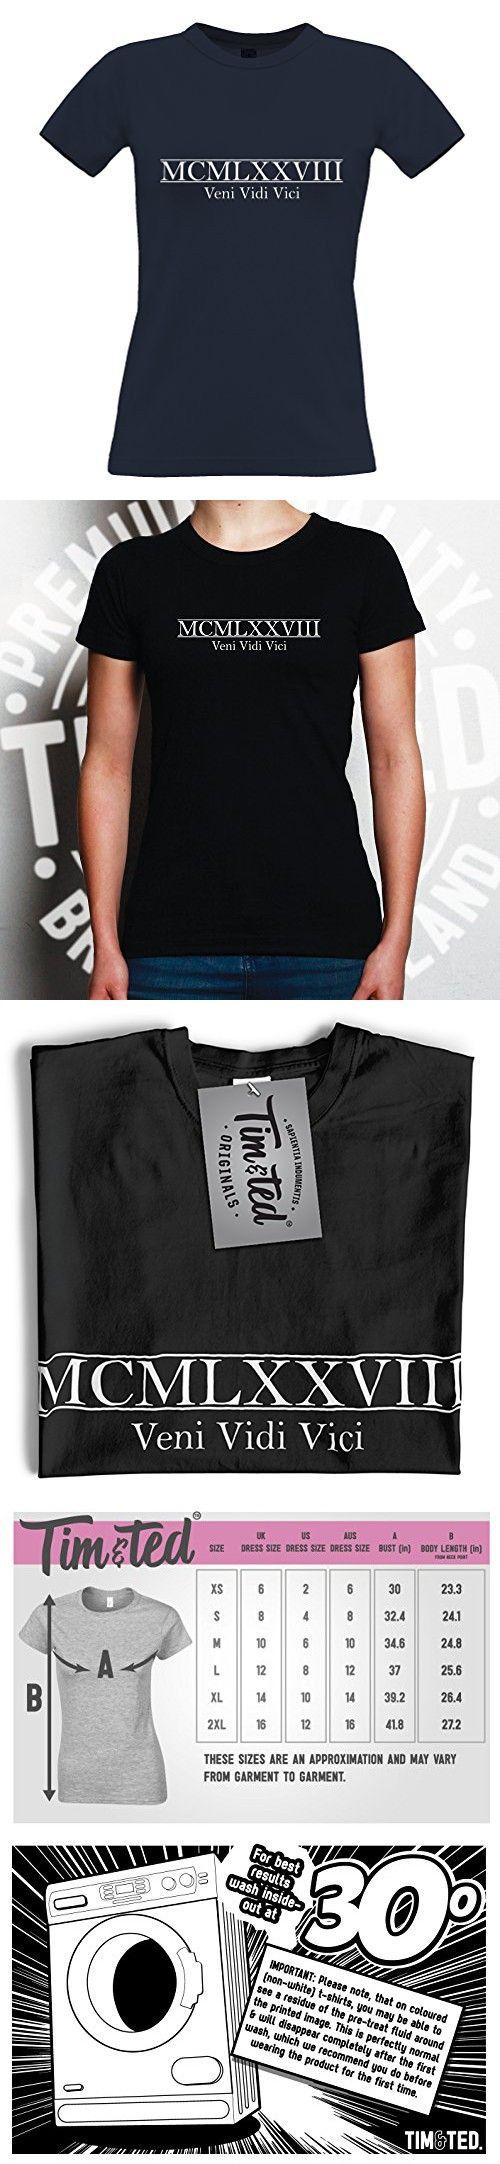 40th Birthday//Gift T-Shirt//Tee Shirt ~ Colours MCMLXXVIII Roman Numeral 1978